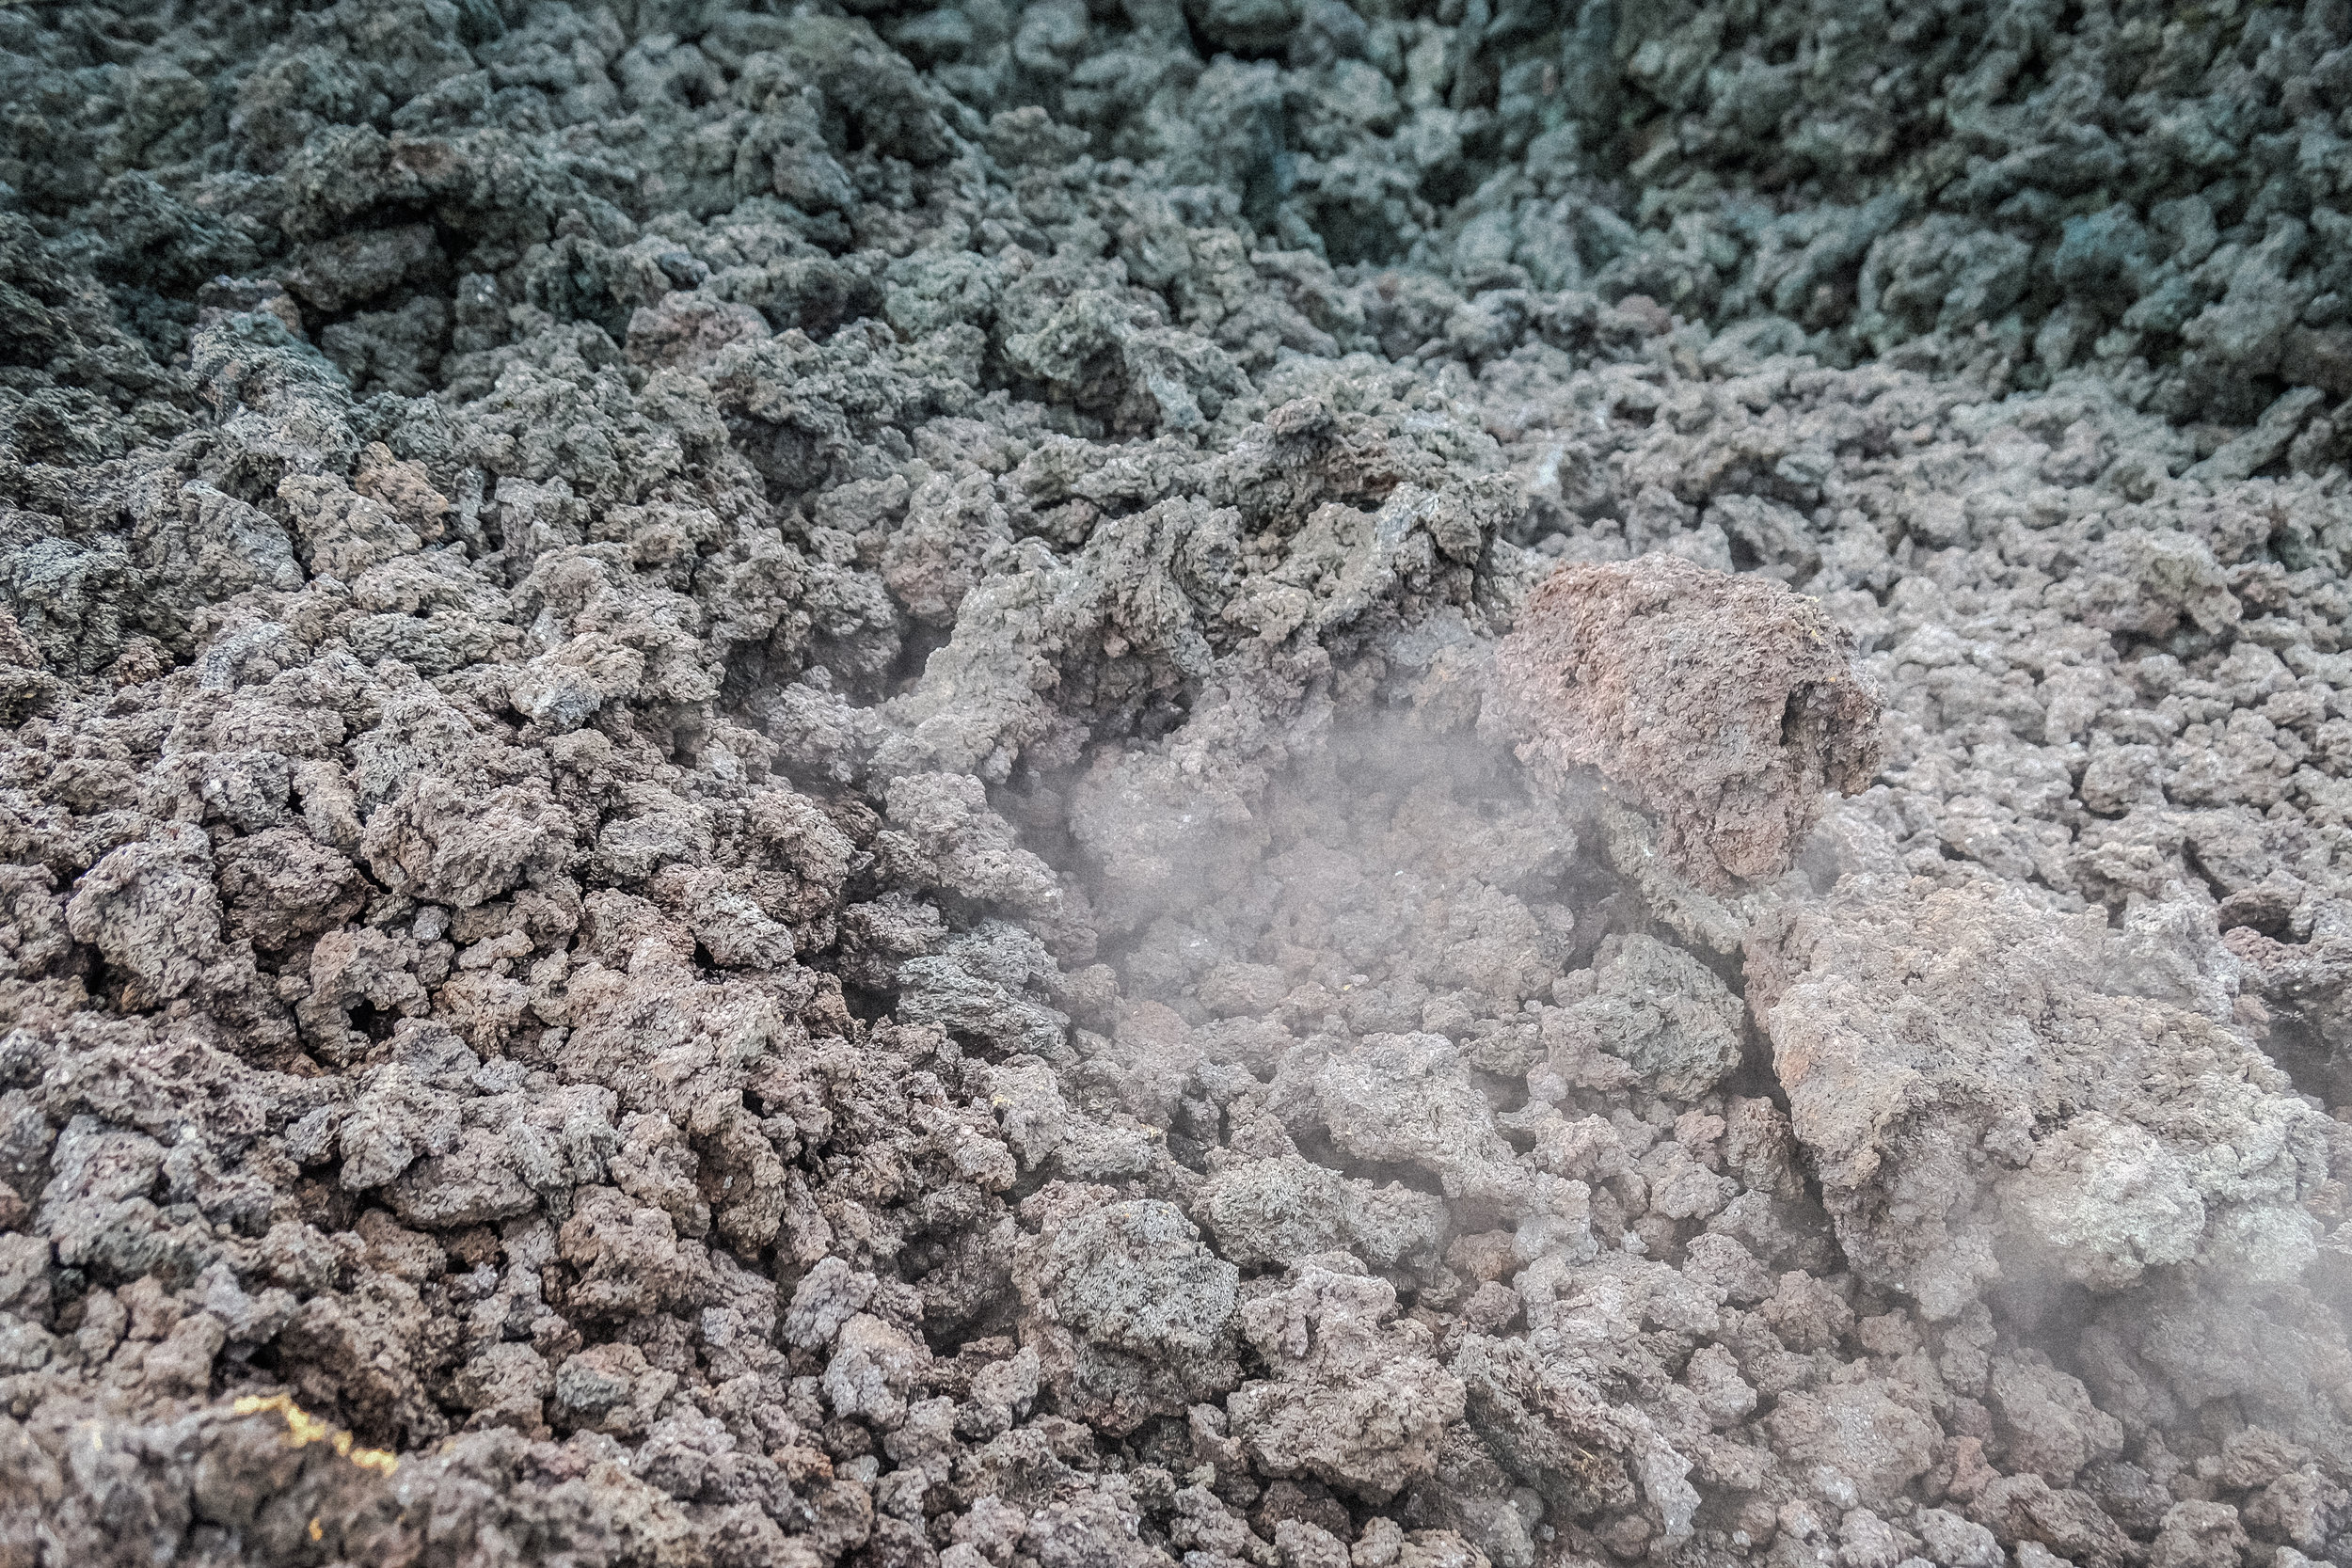 Lava Rock and Volcanic Steam, Vulcán de Pacaya, Guatemala